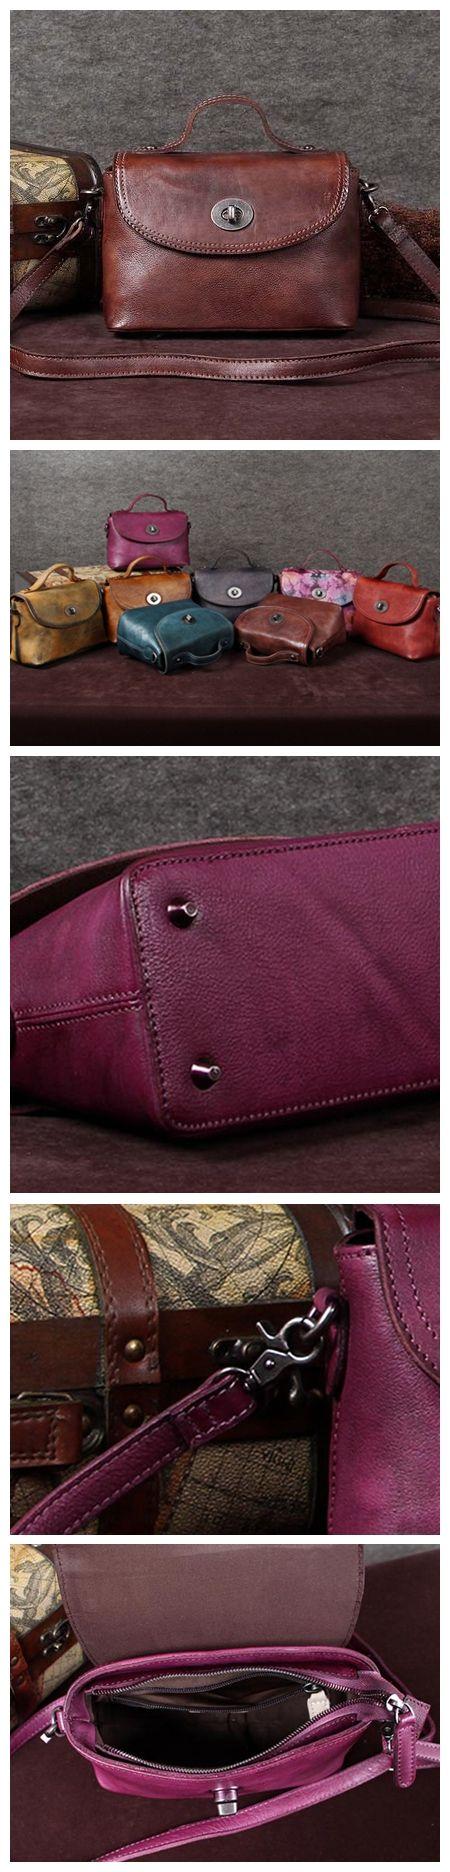 Handmade Leather Messenger Bag, Cross-body Shoulder Bag, Women Satchel Bag A0002 $129.00 USD